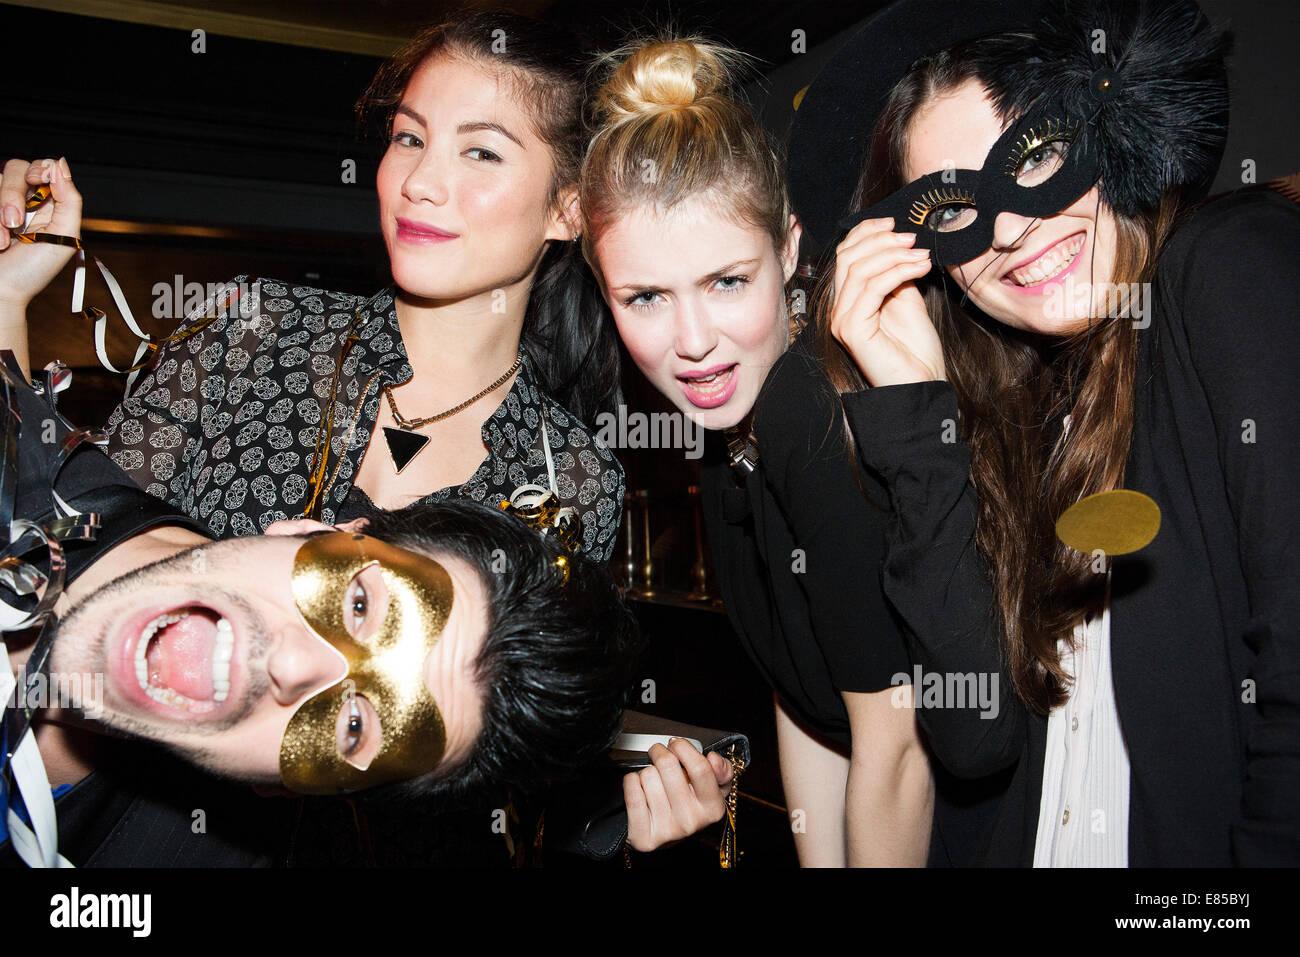 Les amis s'amusant celebrating at party Photo Stock